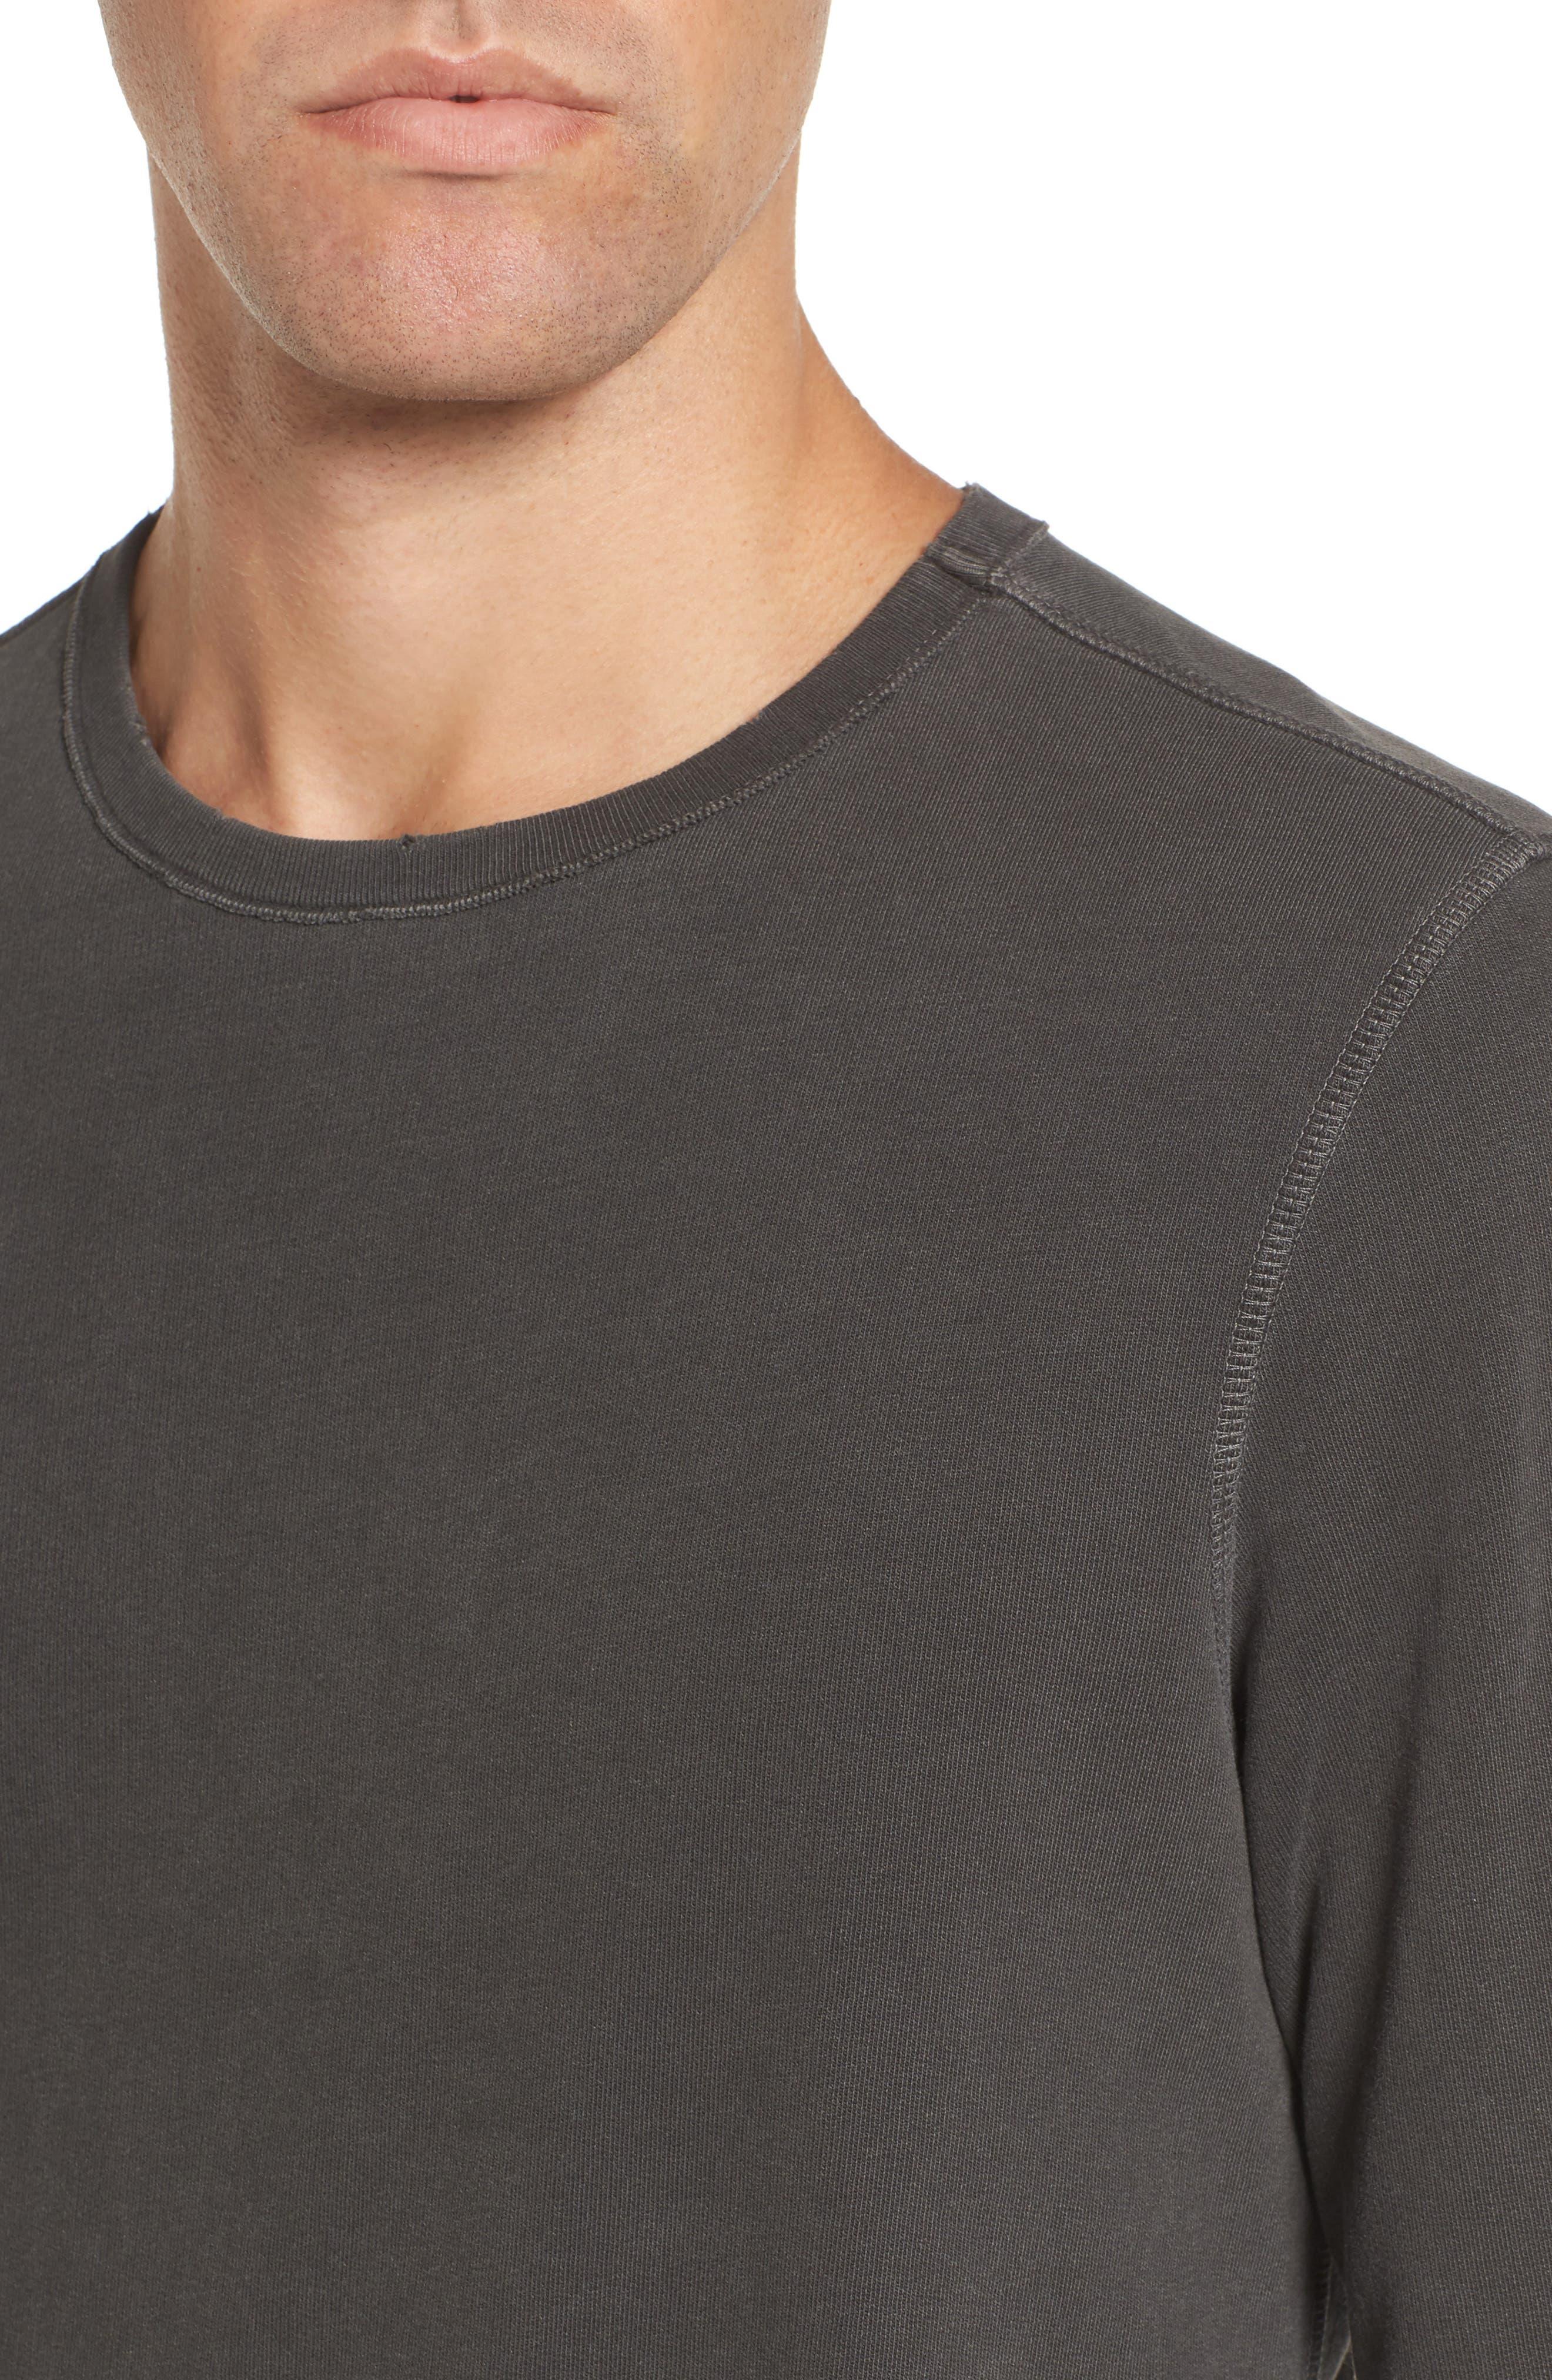 Brendan Raw Edge Crewneck Sweatshirt,                             Alternate thumbnail 4, color,                             001